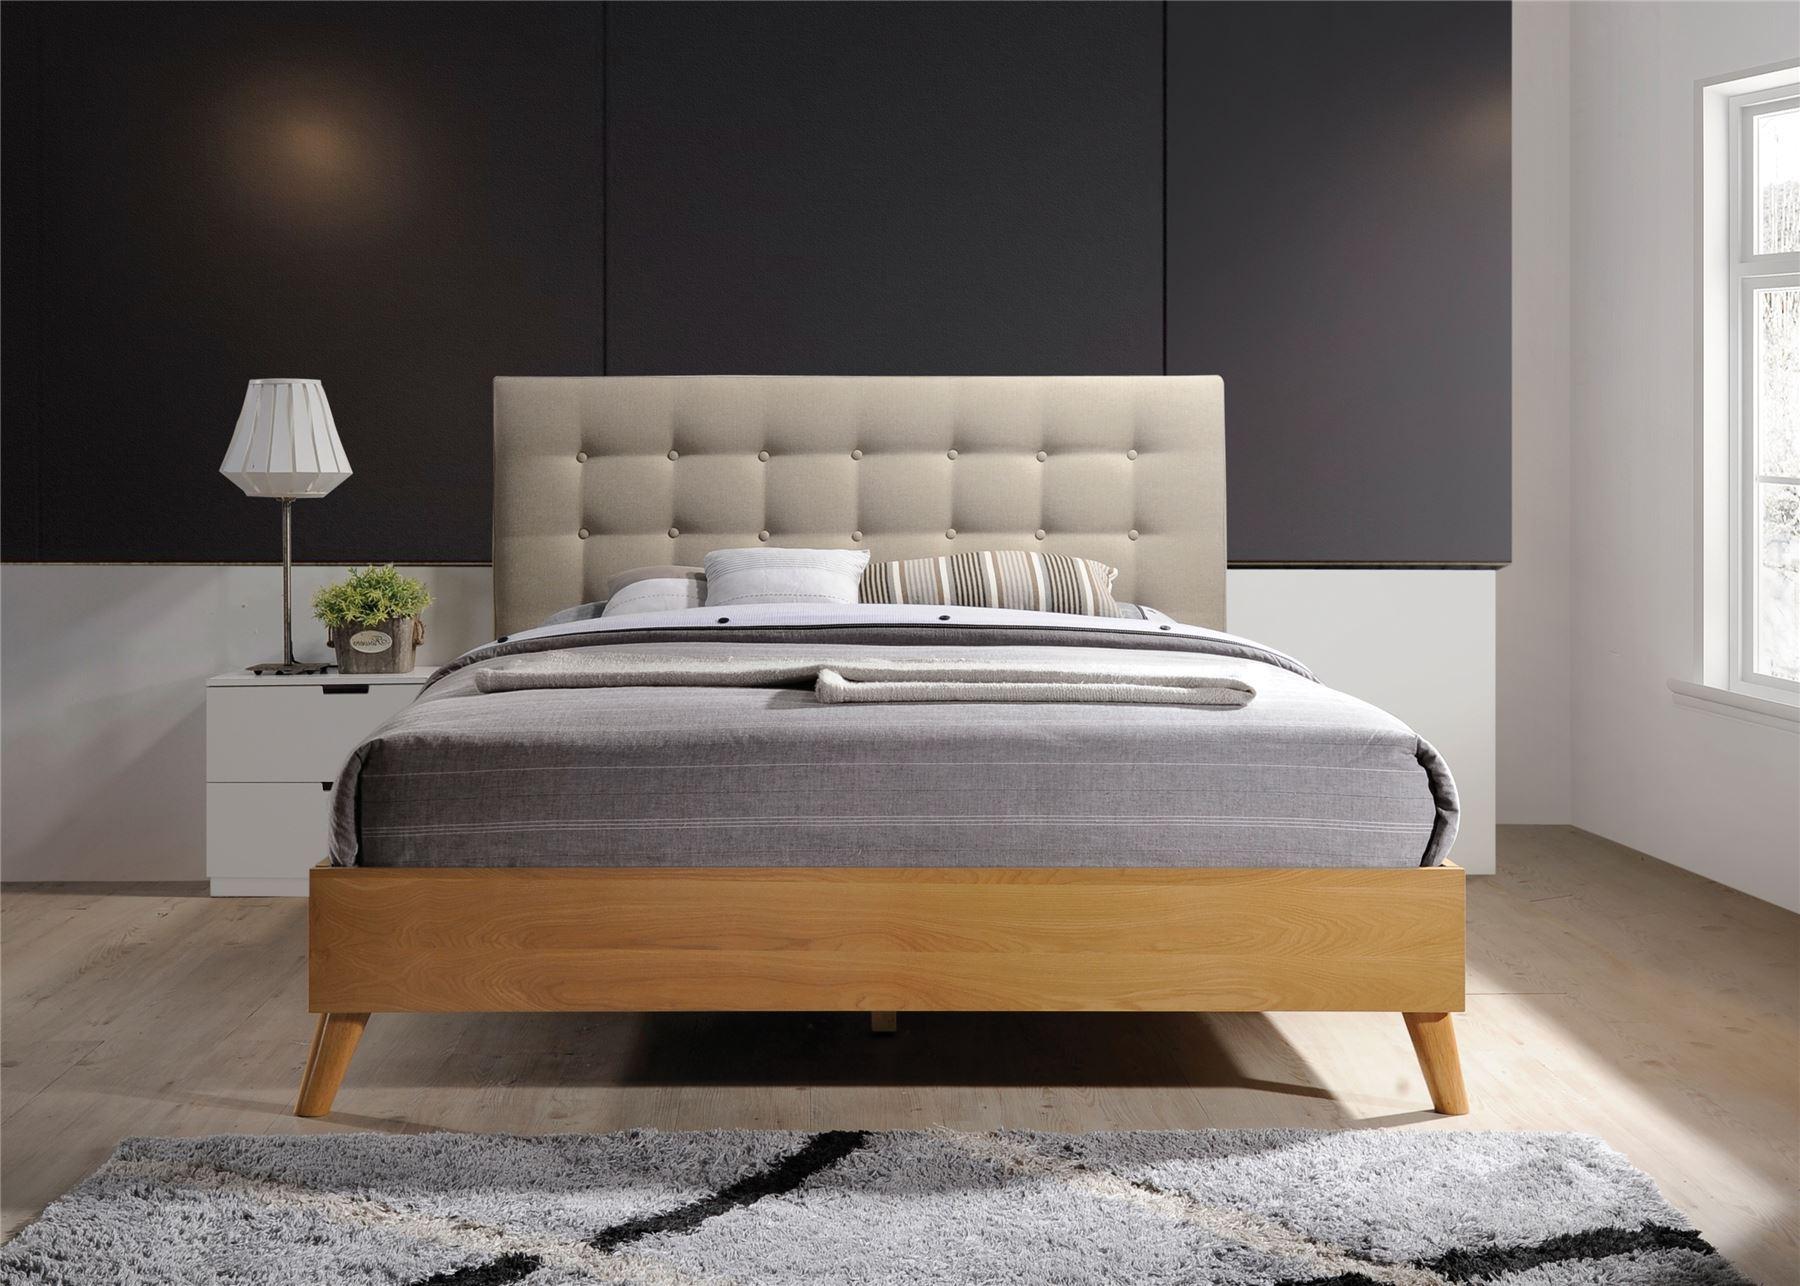 Gino Bed Frame Beige Fabric Oak Wood King Size 5FT 150cm